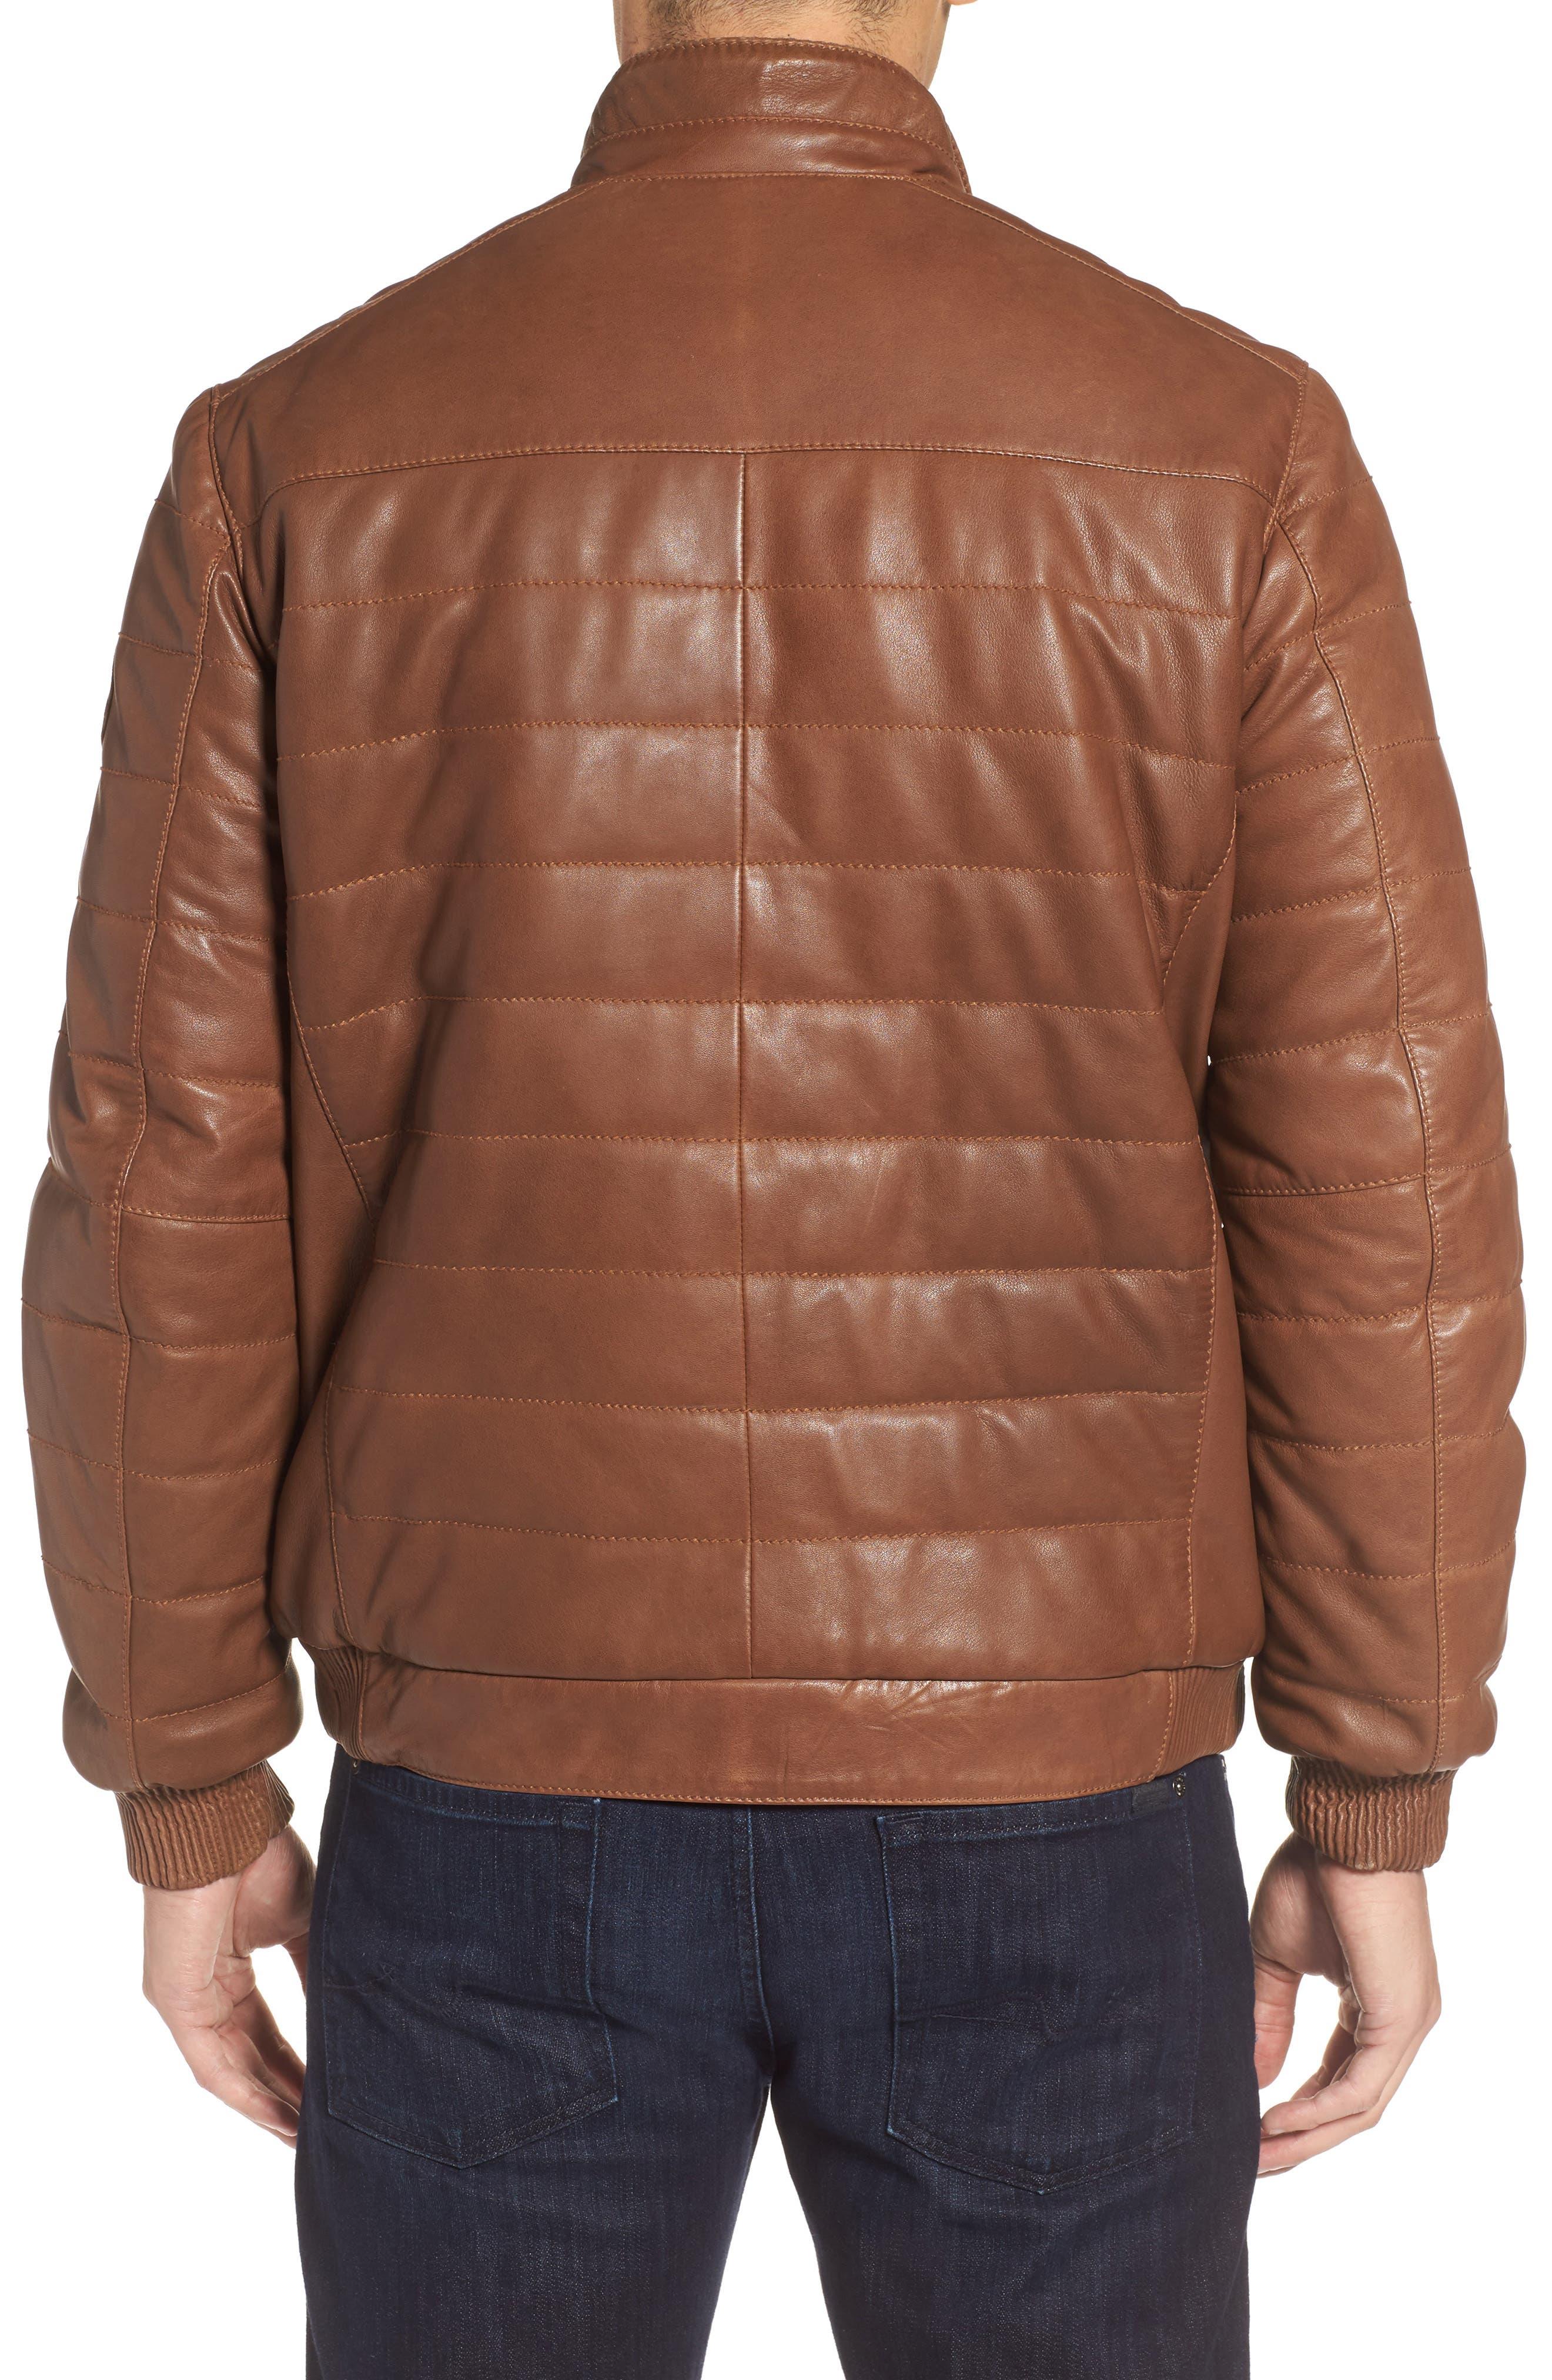 Snowside Leather Bomber Jacket,                             Alternate thumbnail 2, color,                             200